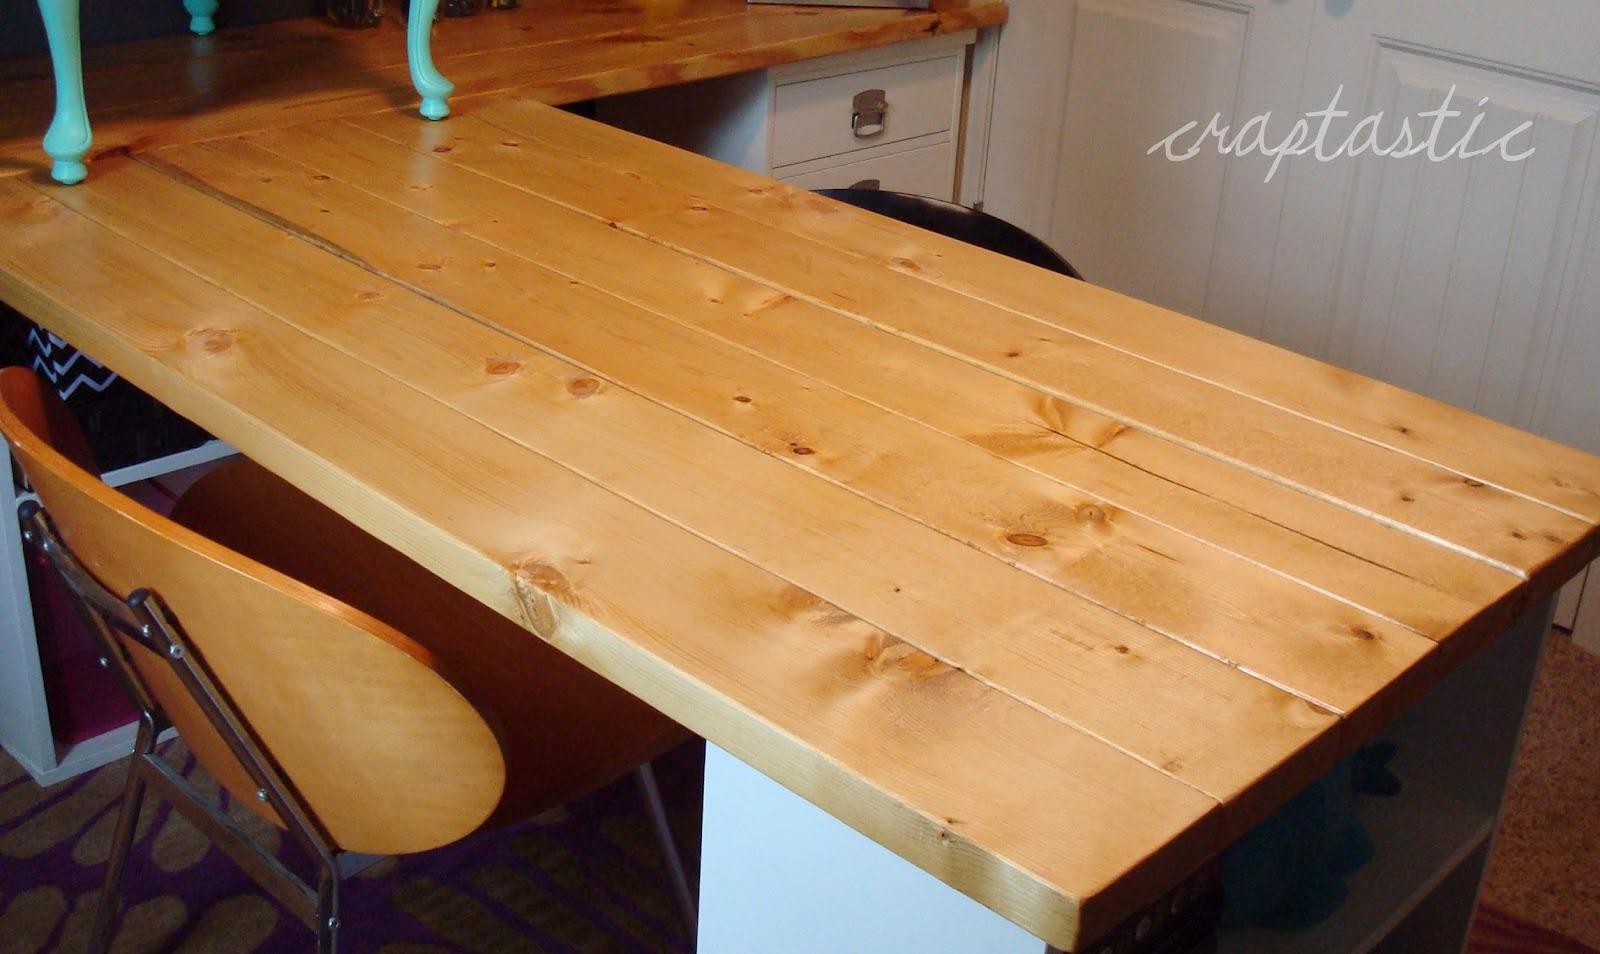 CRAPTASTIC: DIY Patio Table With Interchangeable Centerpiece!